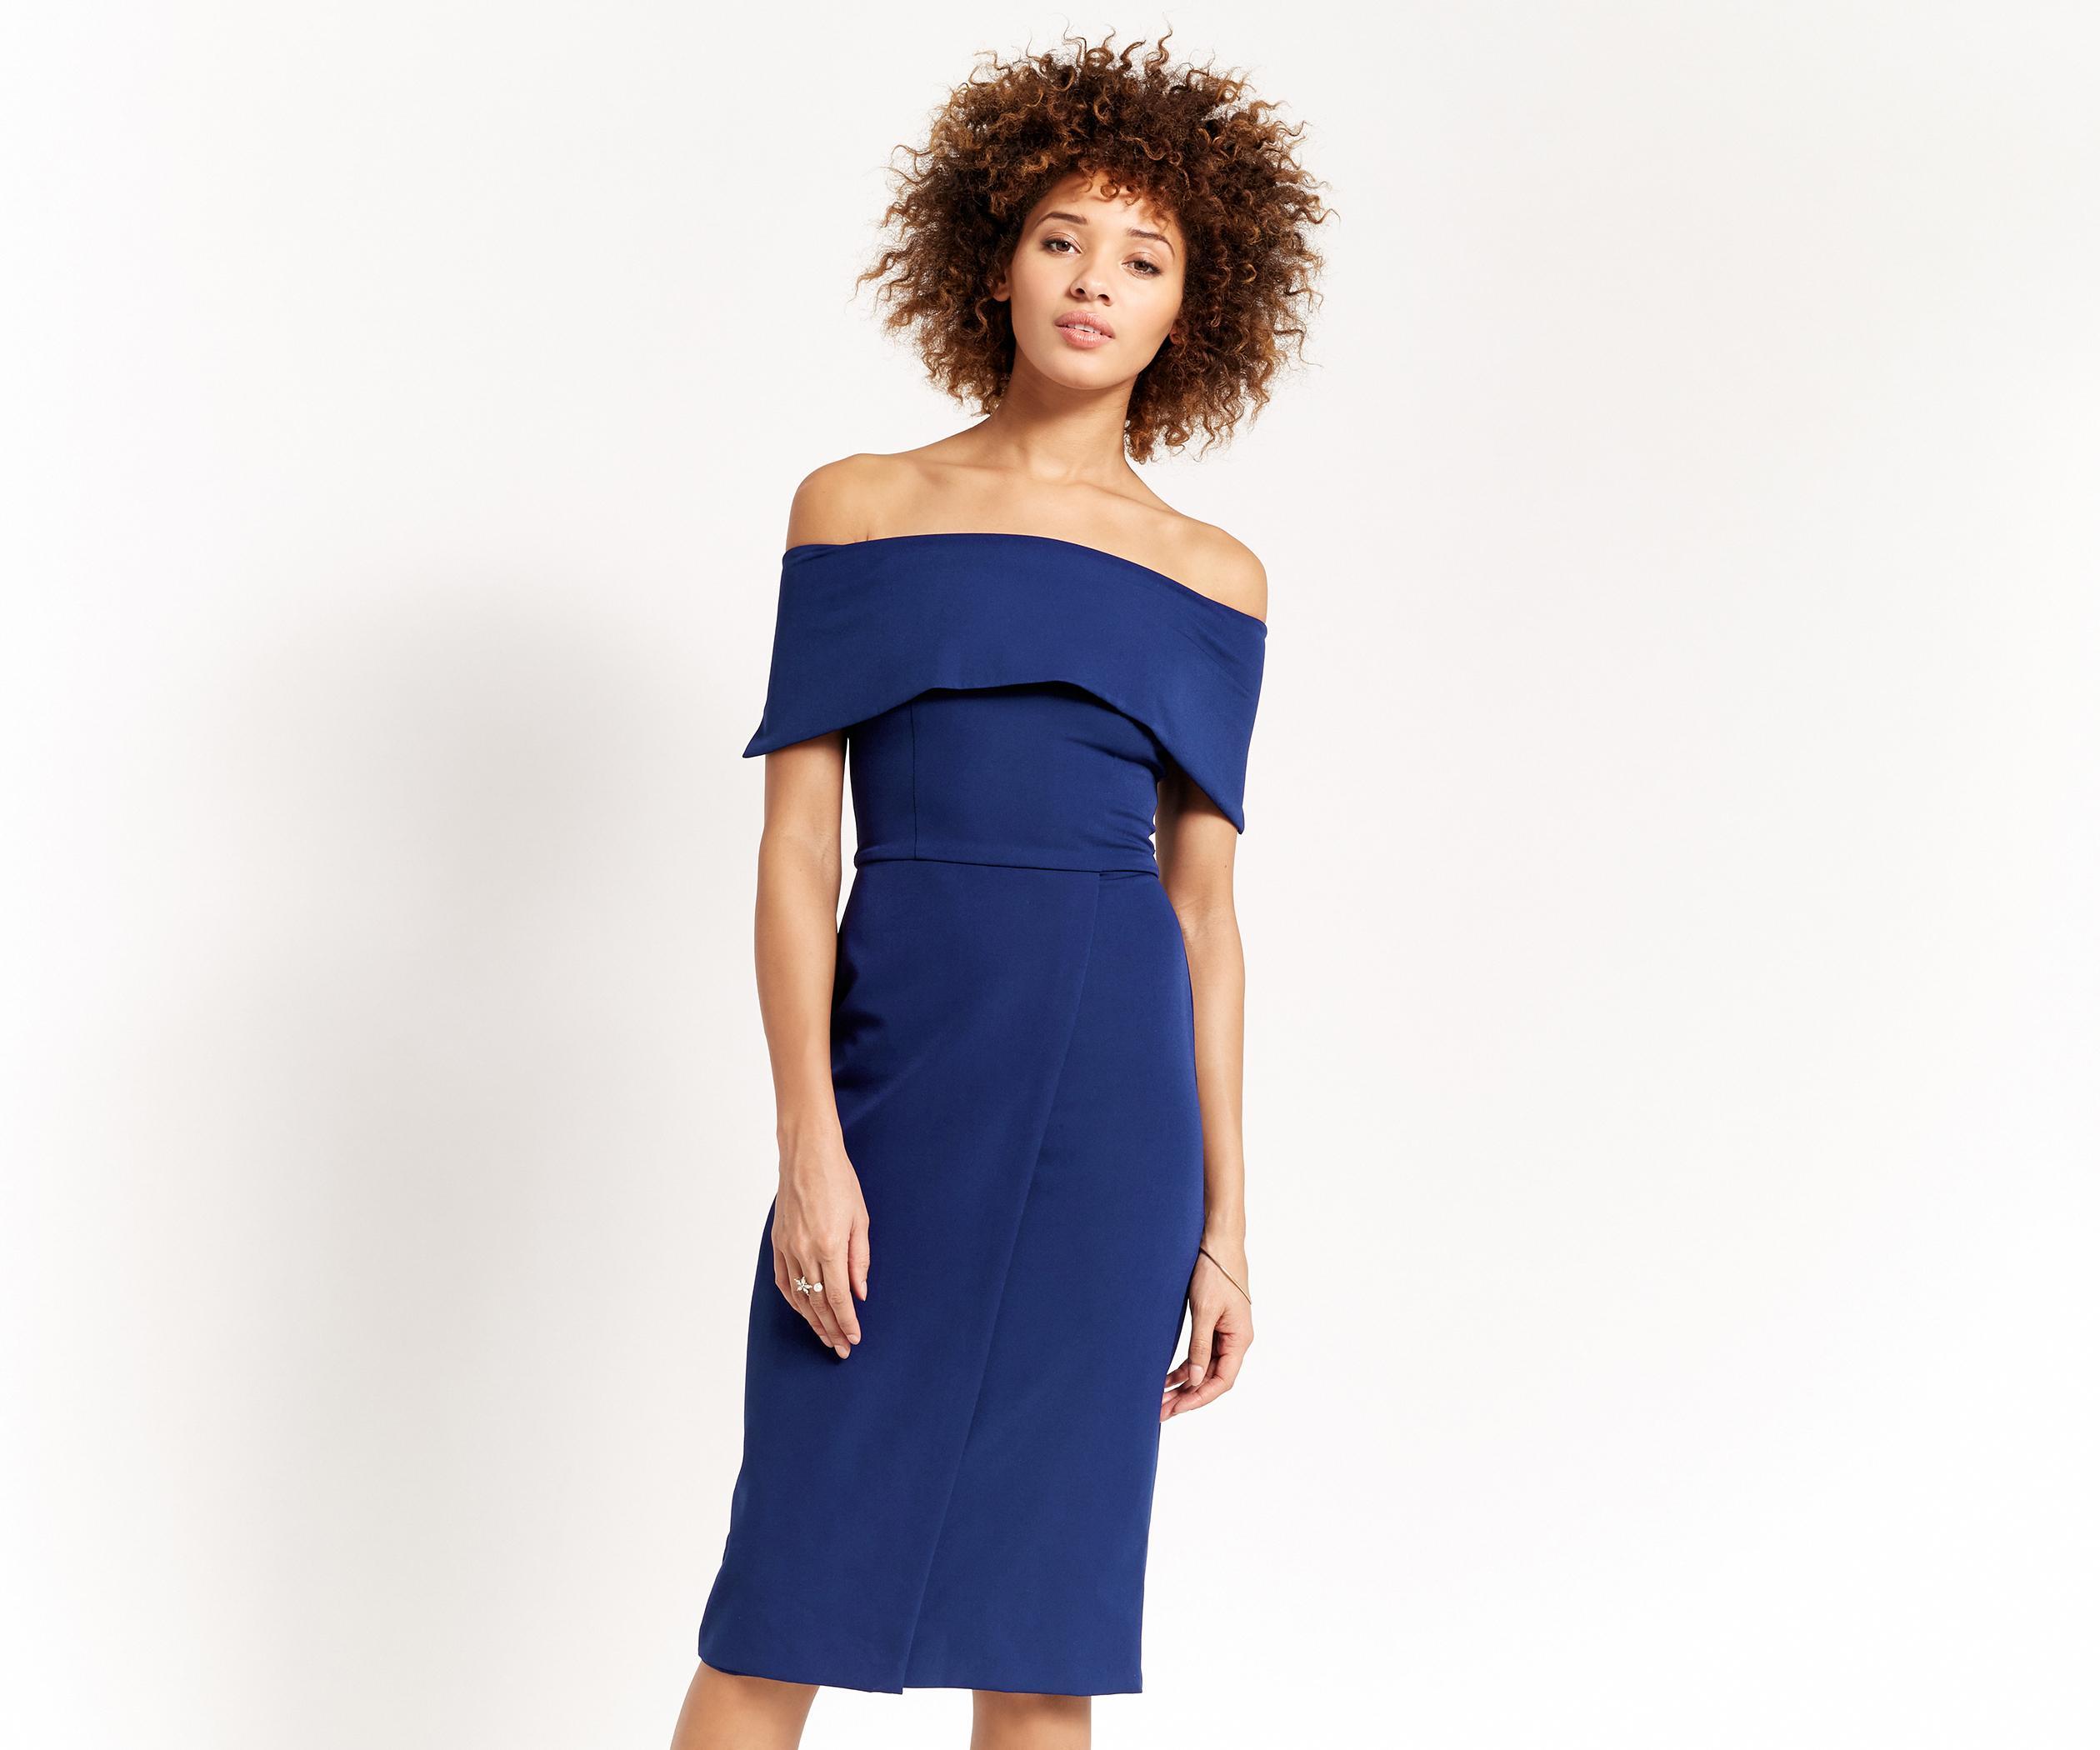 910afb3ef78e Oasis Bardot Pencil Dress in Blue - Lyst